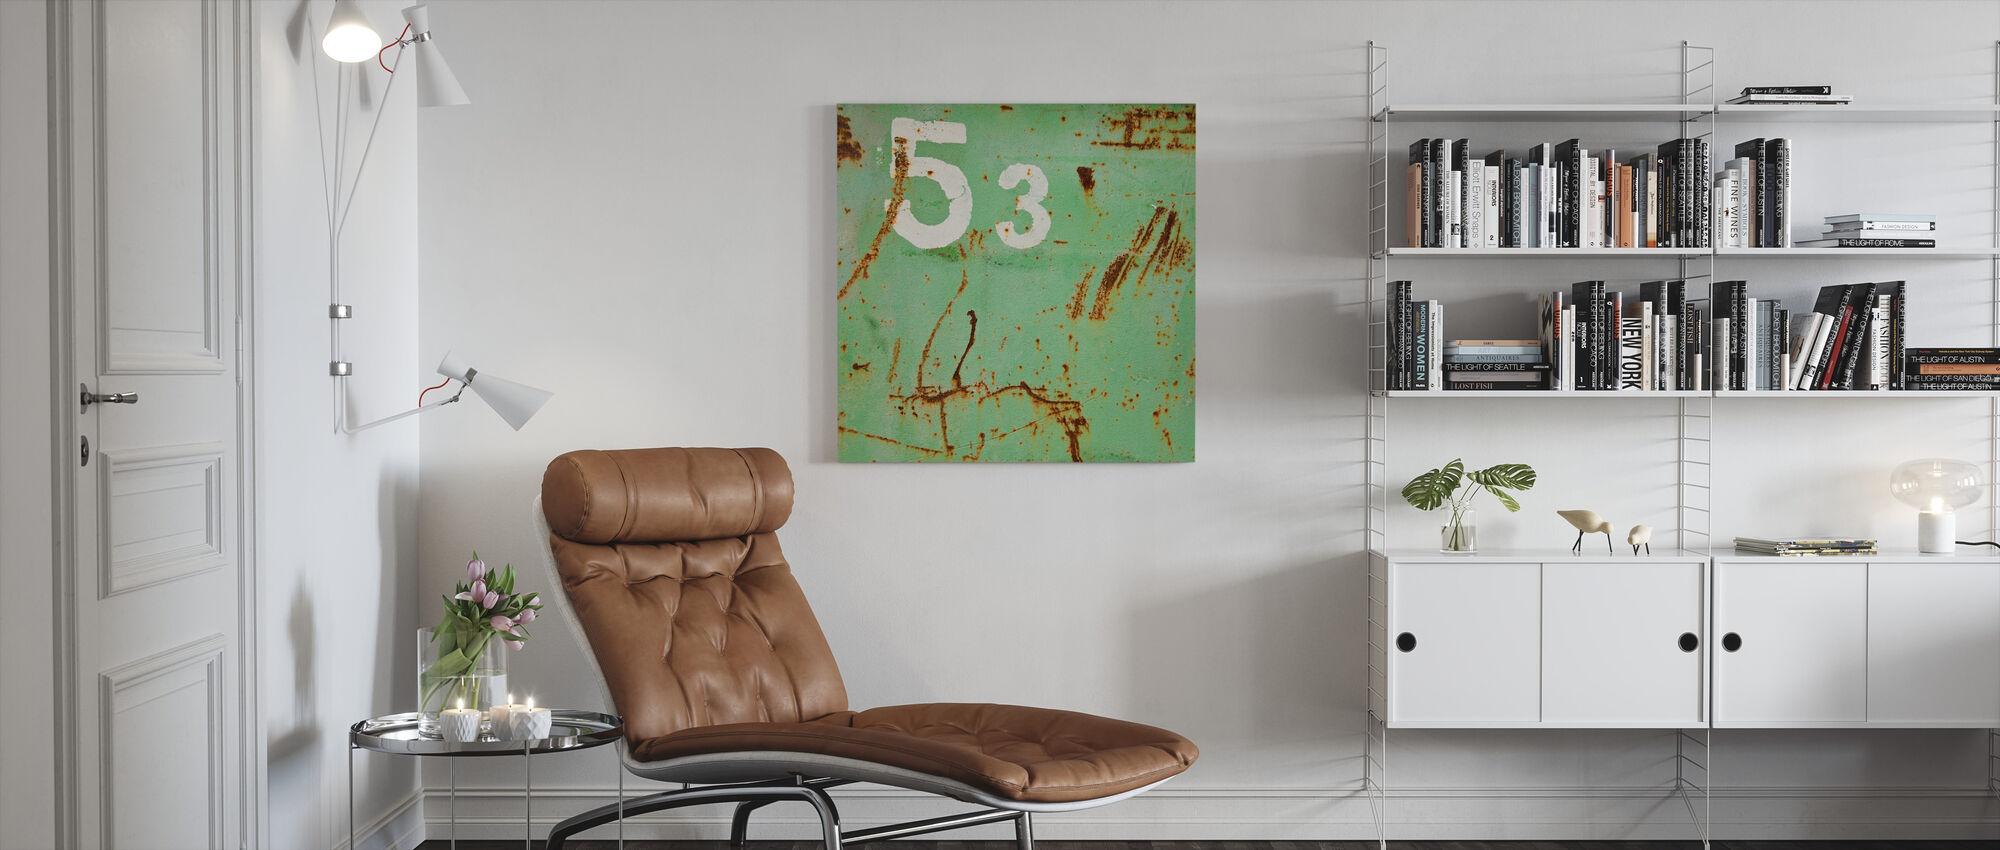 Grunge Fifty-three - Canvas print - Living Room